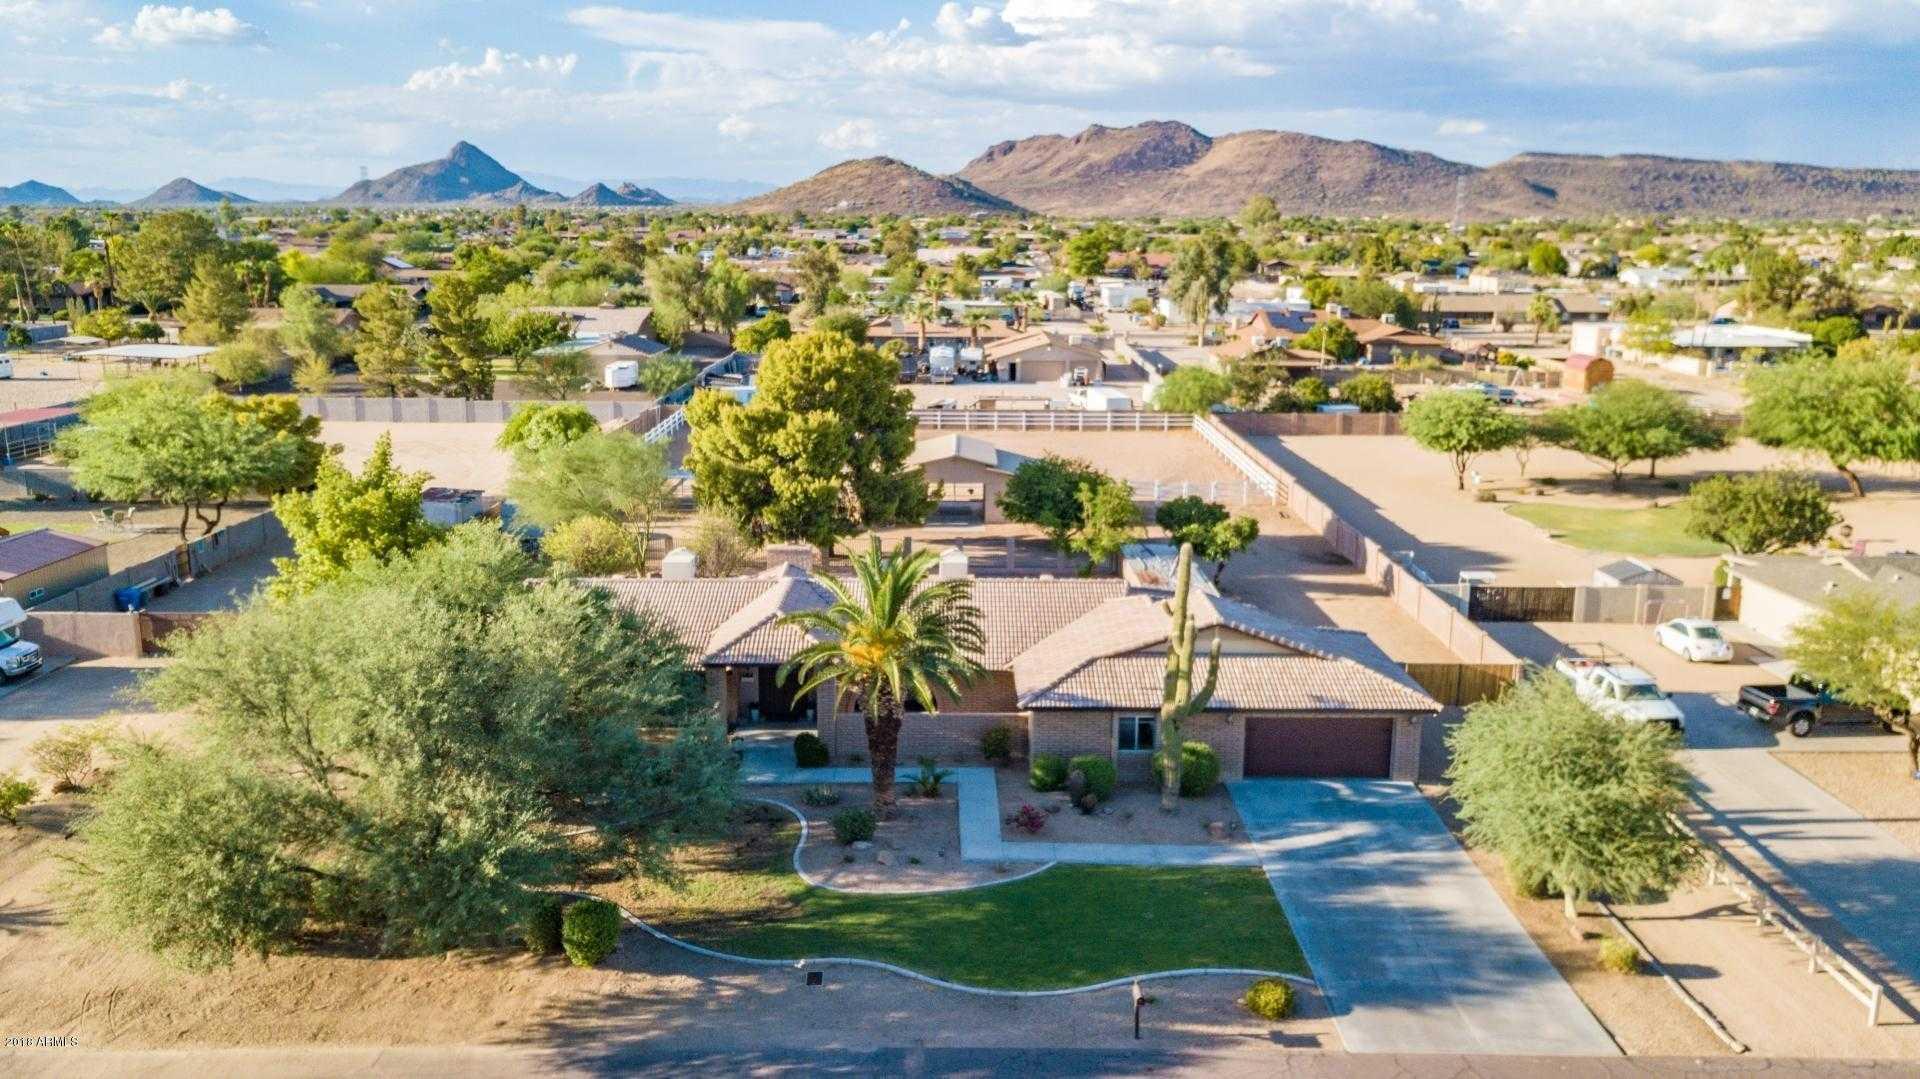 $599,900 - 4Br/3Ba - Home for Sale in Saddleback Meadows Unit 5, Glendale